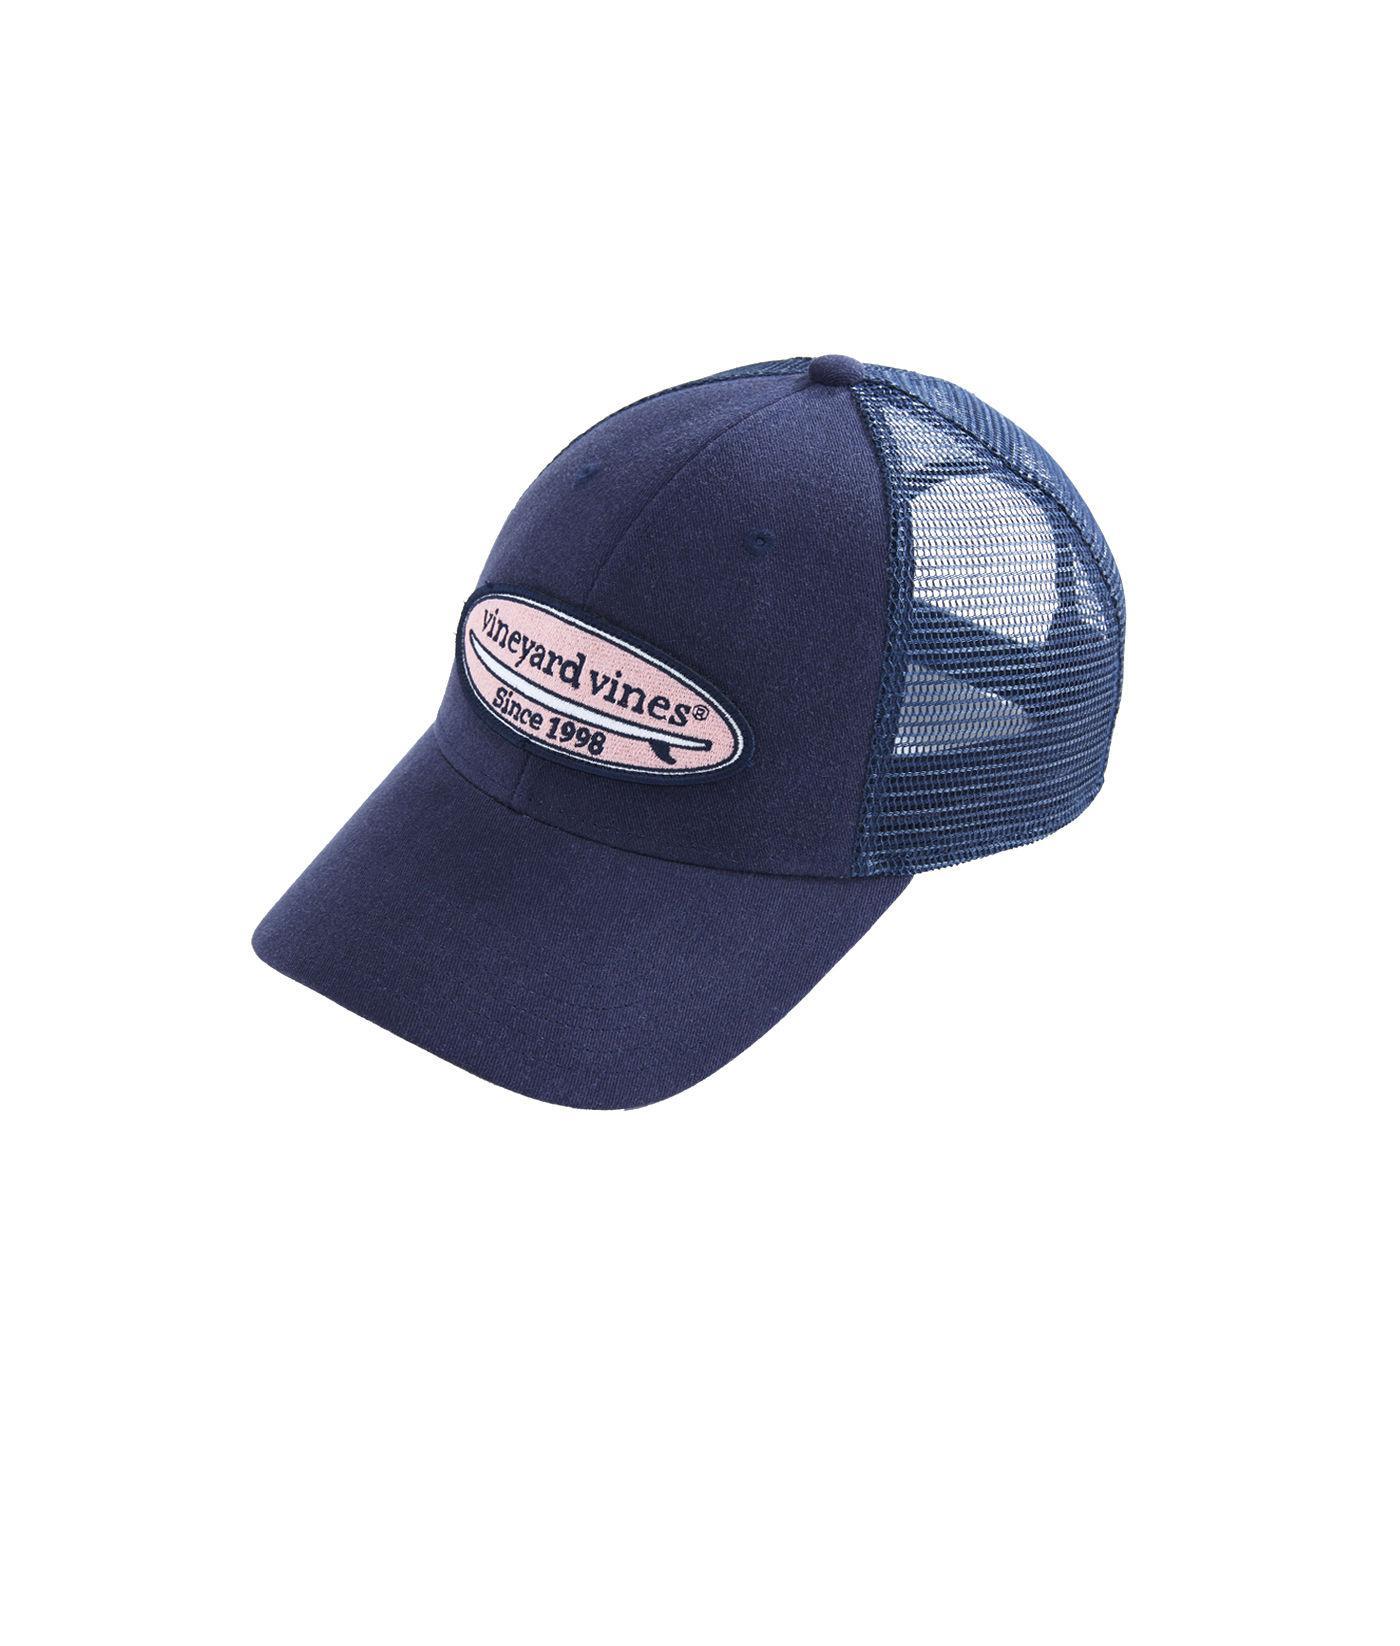 b56fcd944f6 Lyst - Vineyard Vines Surf Patch Trucker Hat in Blue for Men